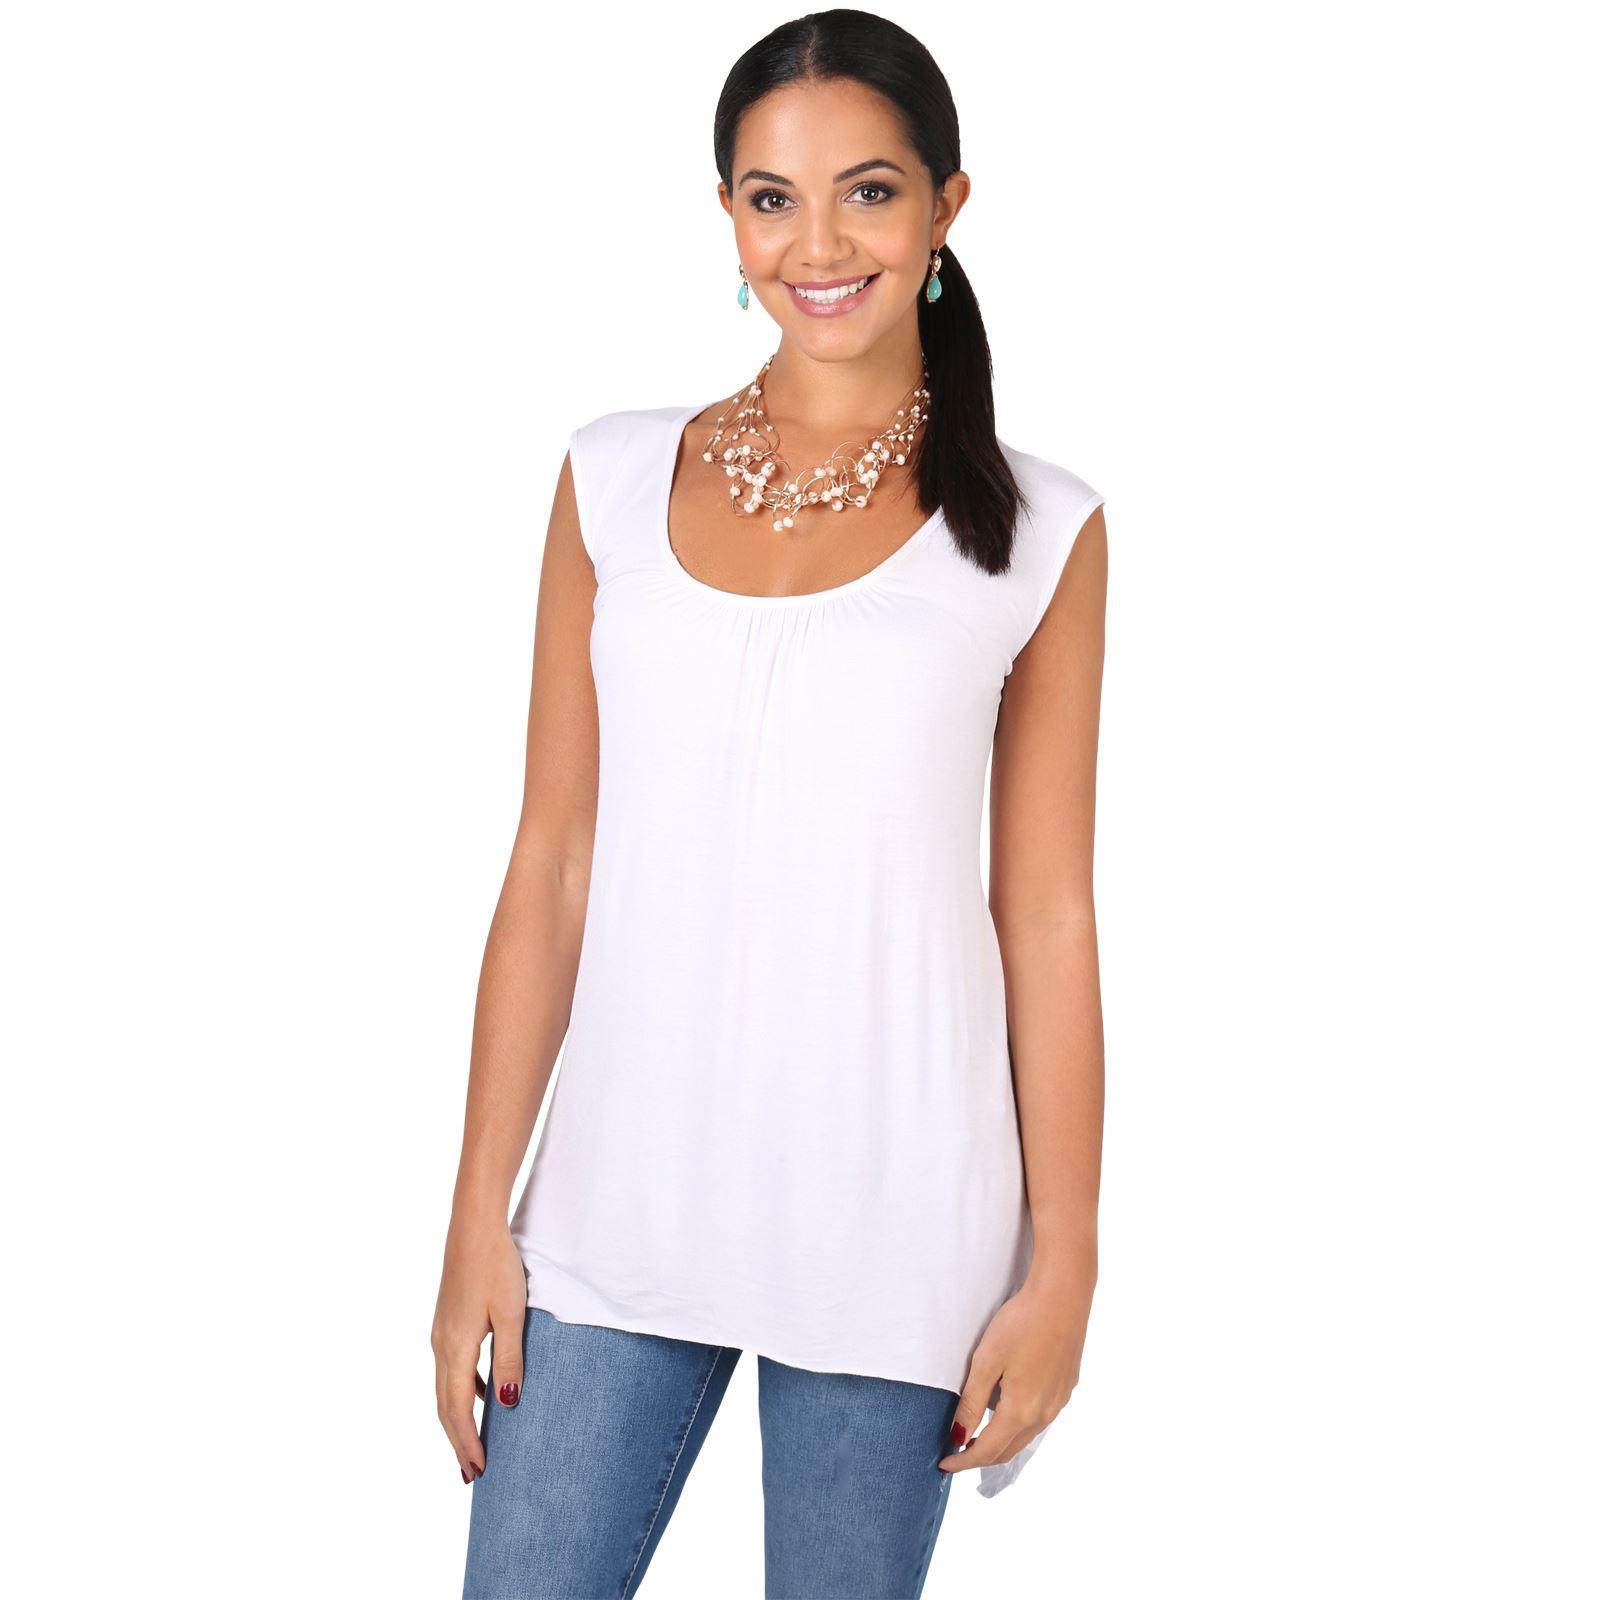 women long top sleeveless pleated tee shirt tunic jersey